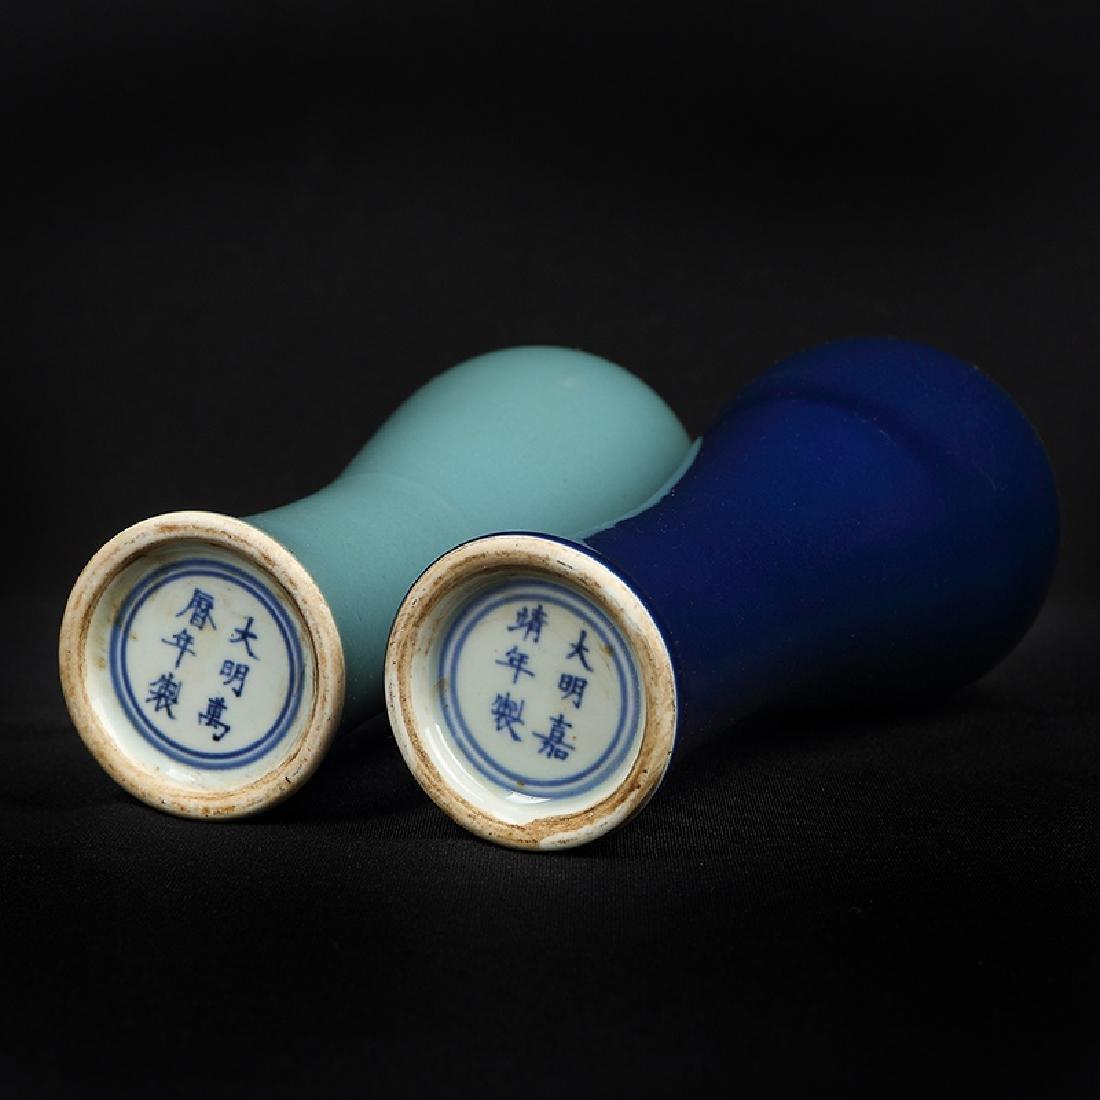 Pair of Chinese Blue Glaze Porcelain Vases - 3